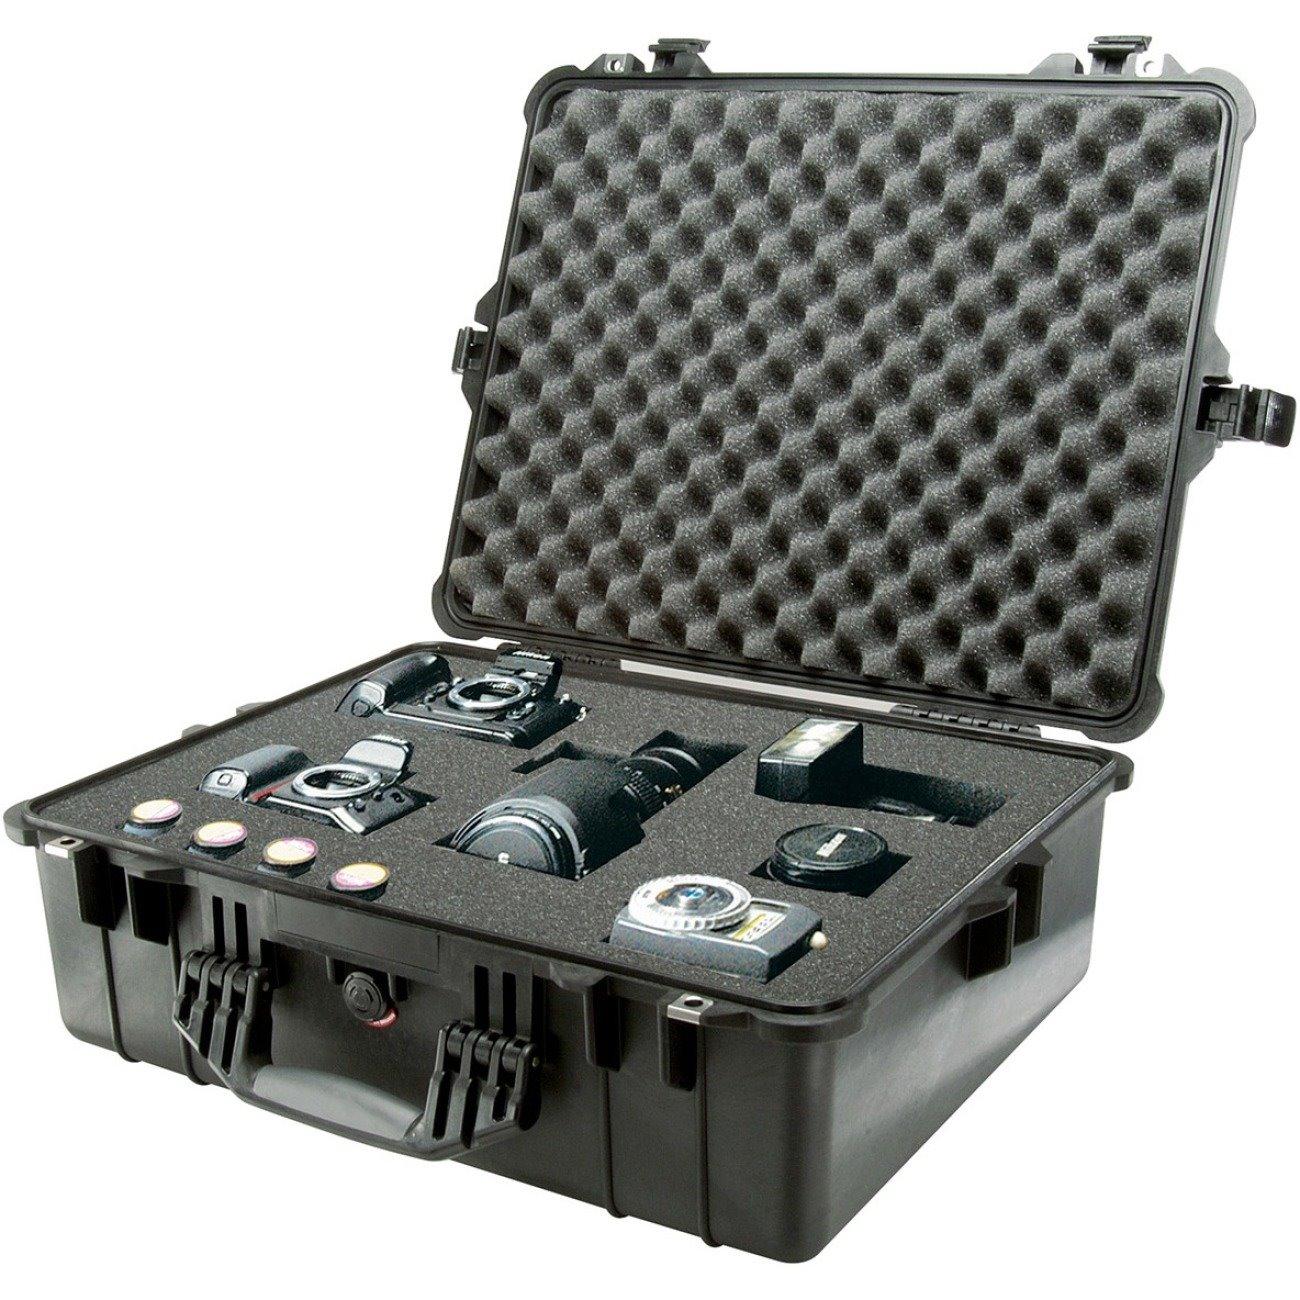 Pelican 1600 Shipping Case (Box) for Multipurpose